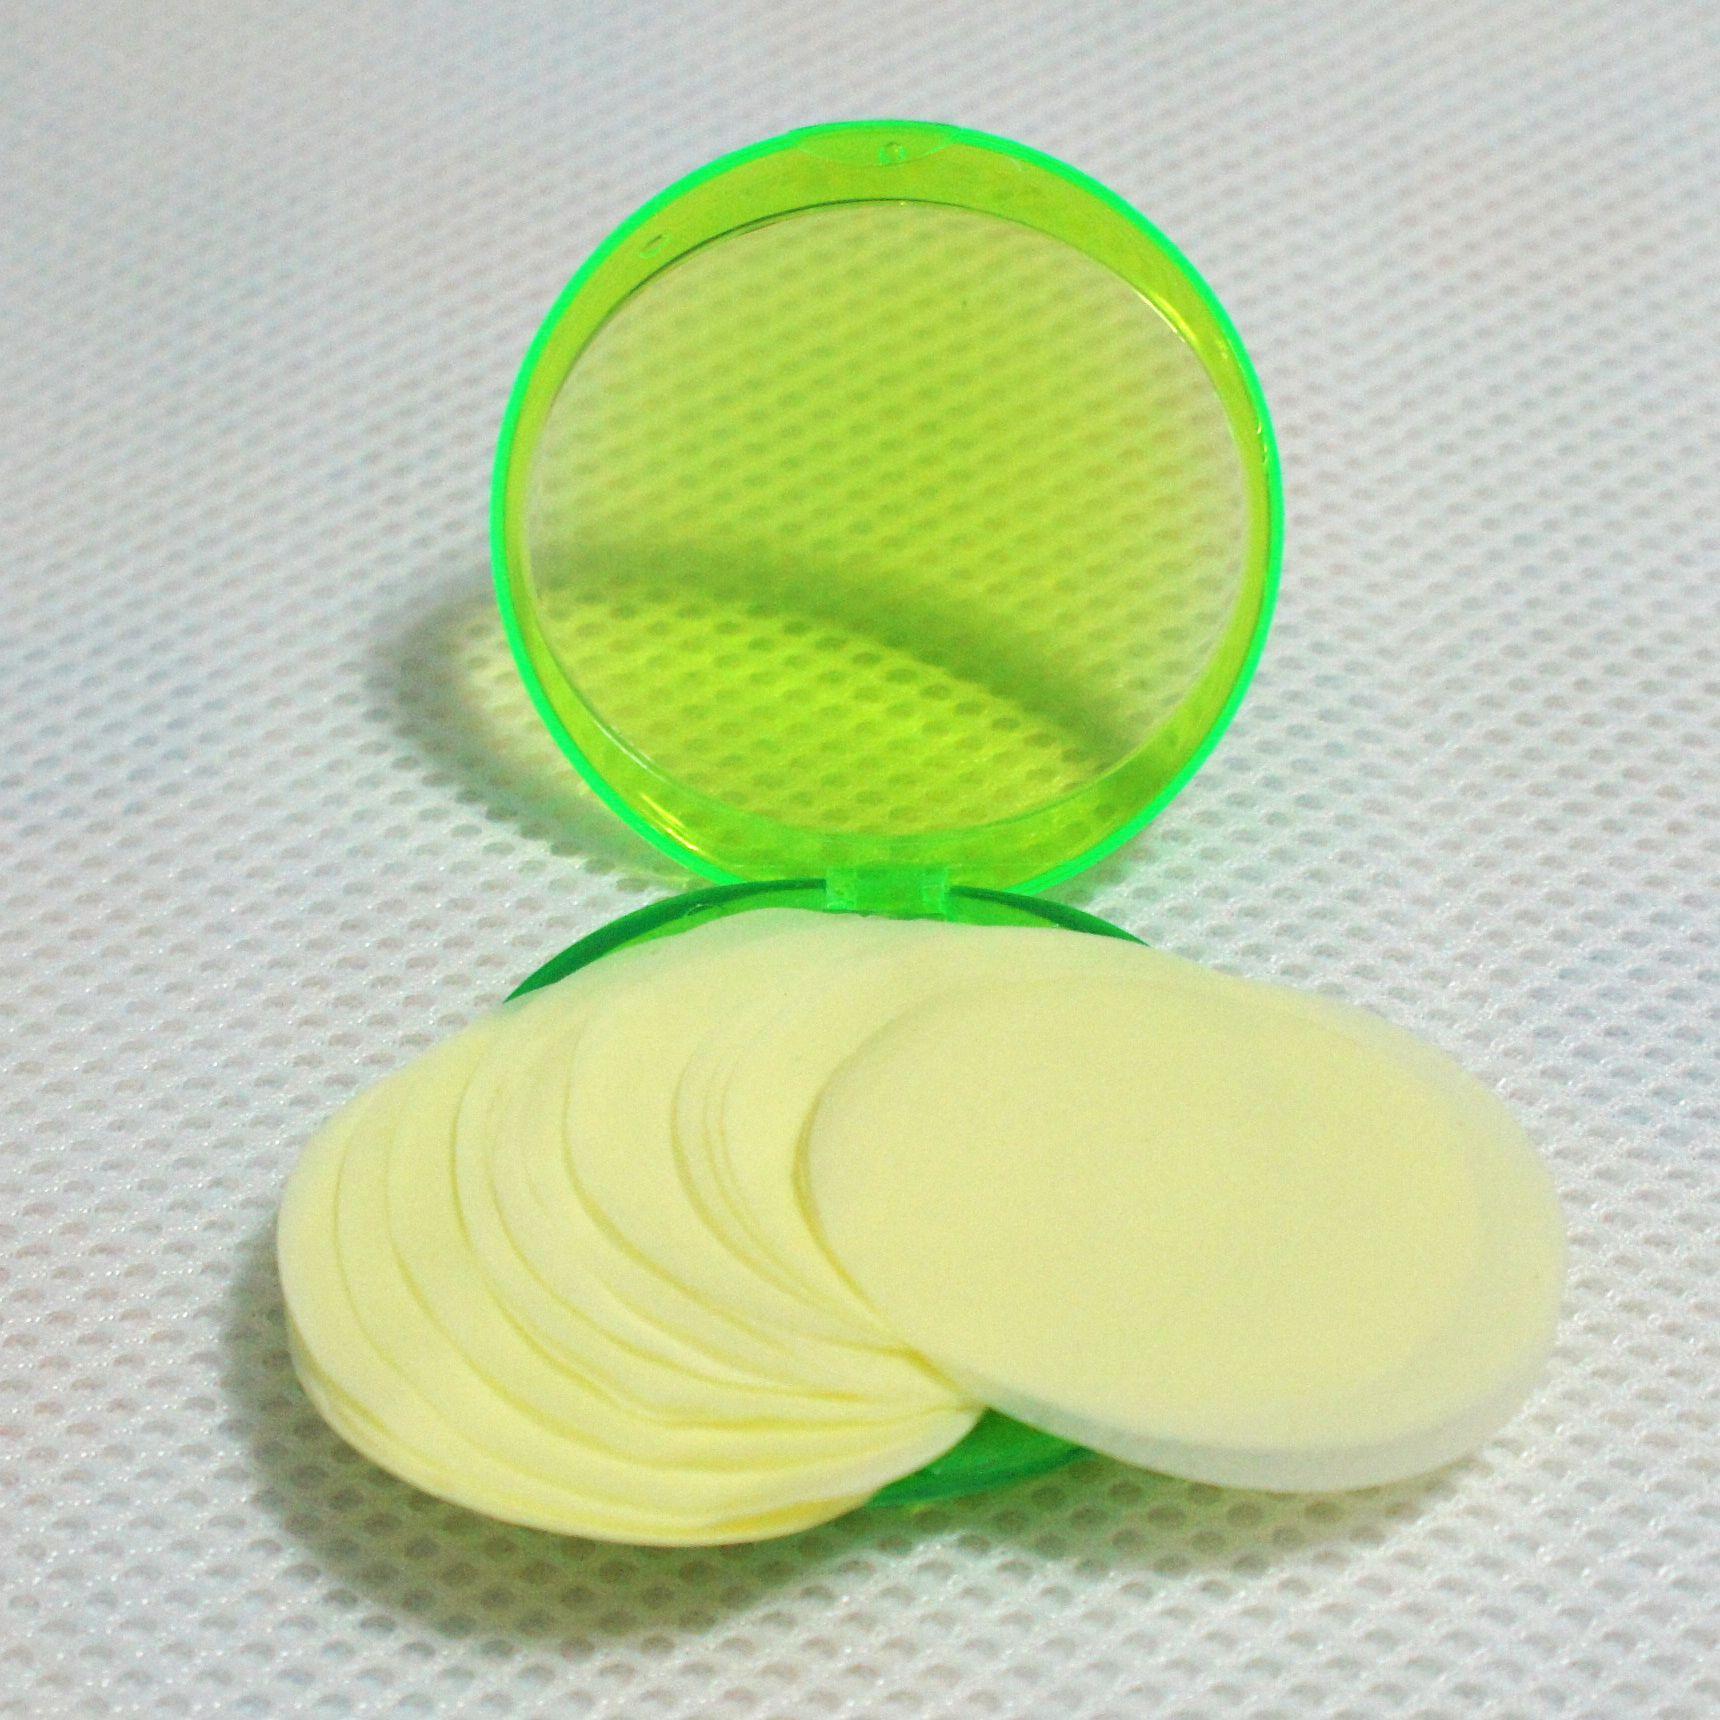 Tourmaline portable querysystem disposable scrimshaws antibacterial soap 30<br><br>Aliexpress